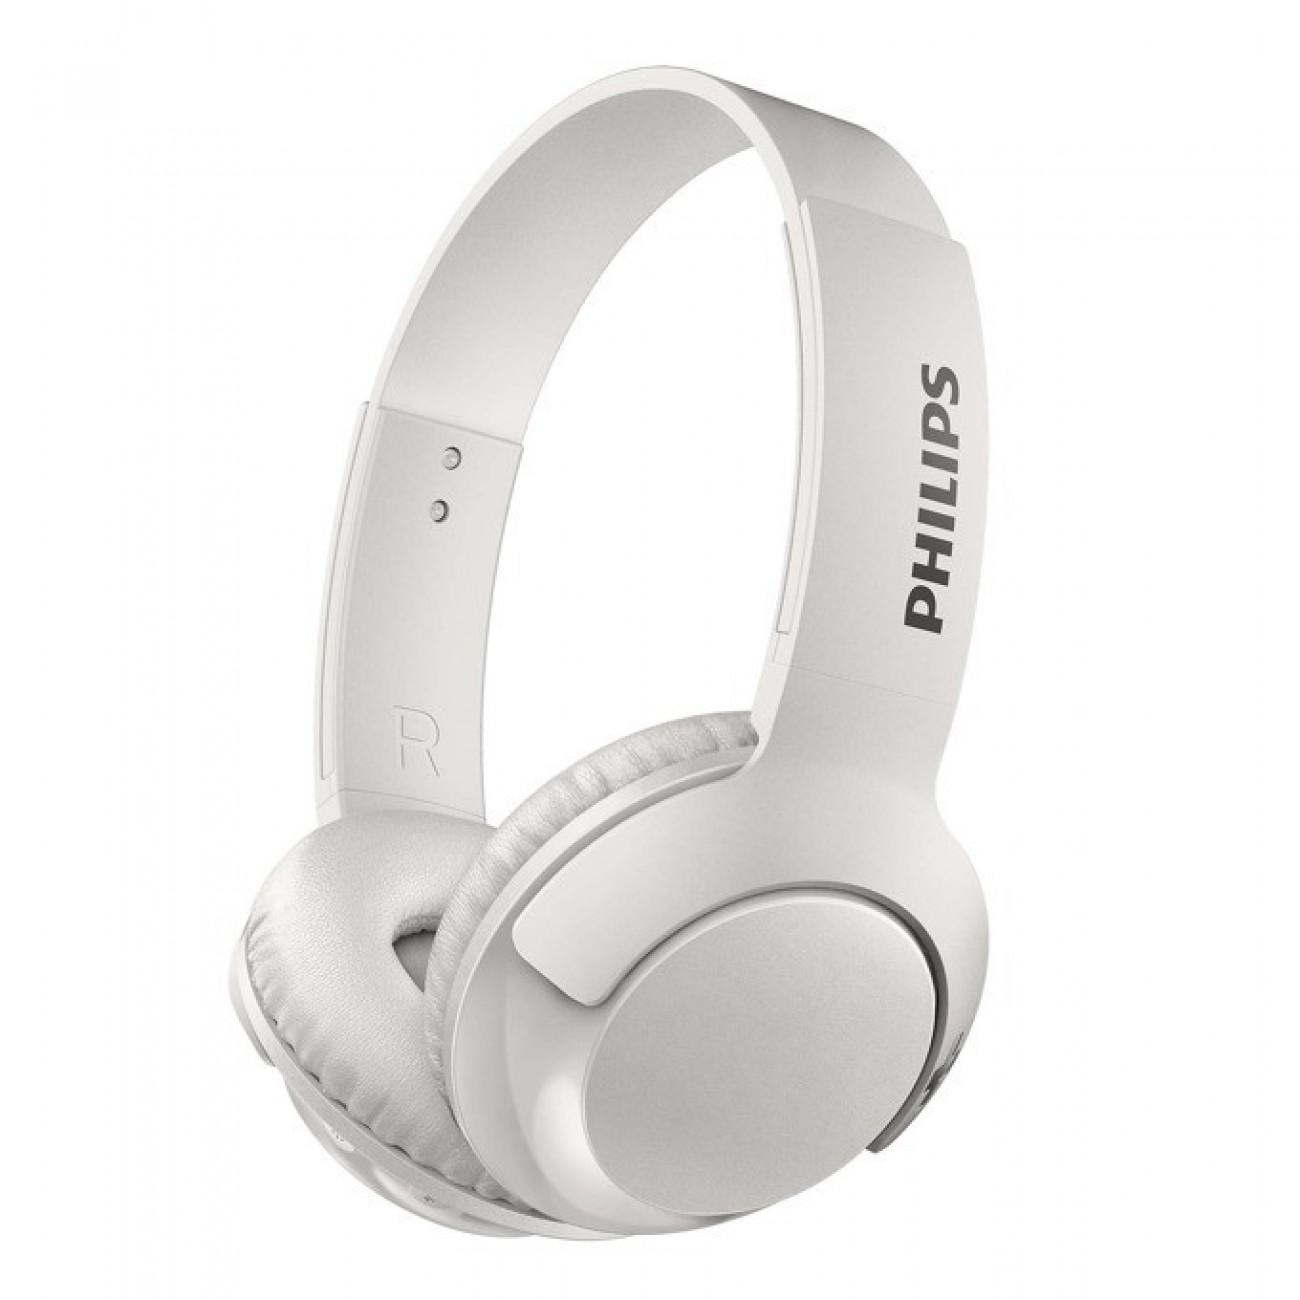 Слушалки Philips SHB3075WT, микрофон, Bluetooth, честотен диапазон 9  21 000 Hz, бели в Слушалки -  | Alleop